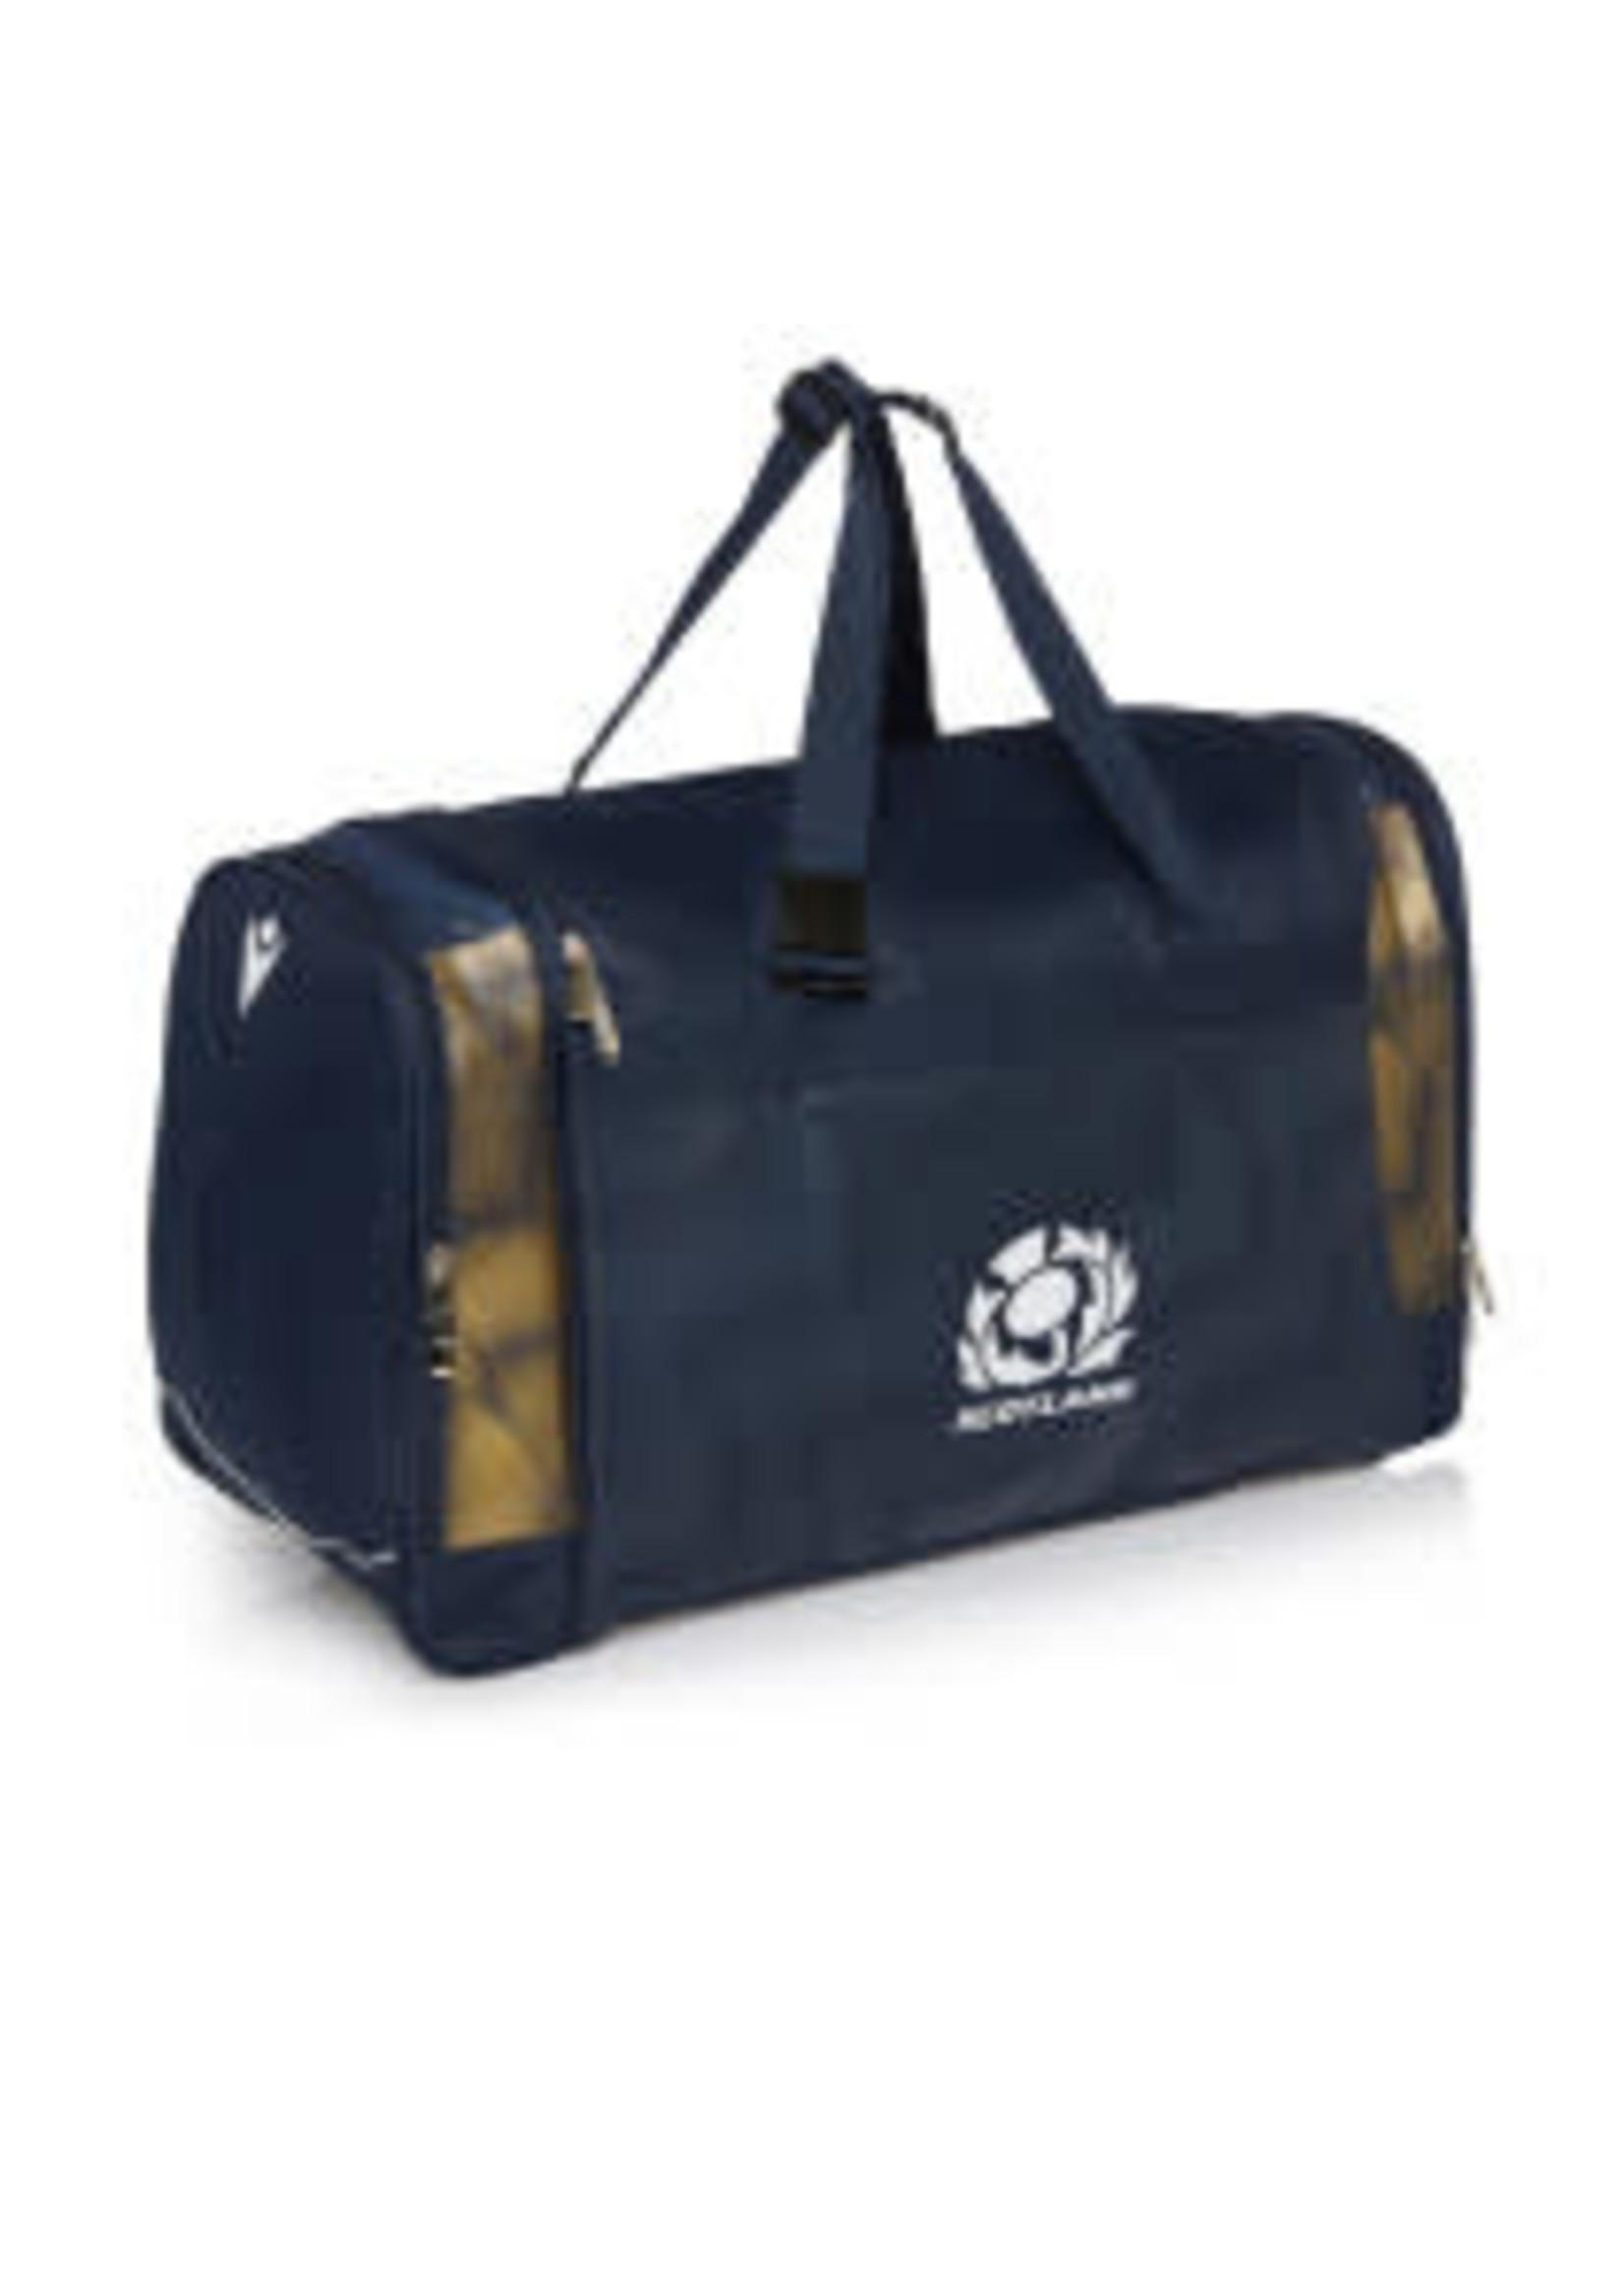 Macron Macron SRU M20 Trio Custom Gym Bag (2020) Navy/Gold